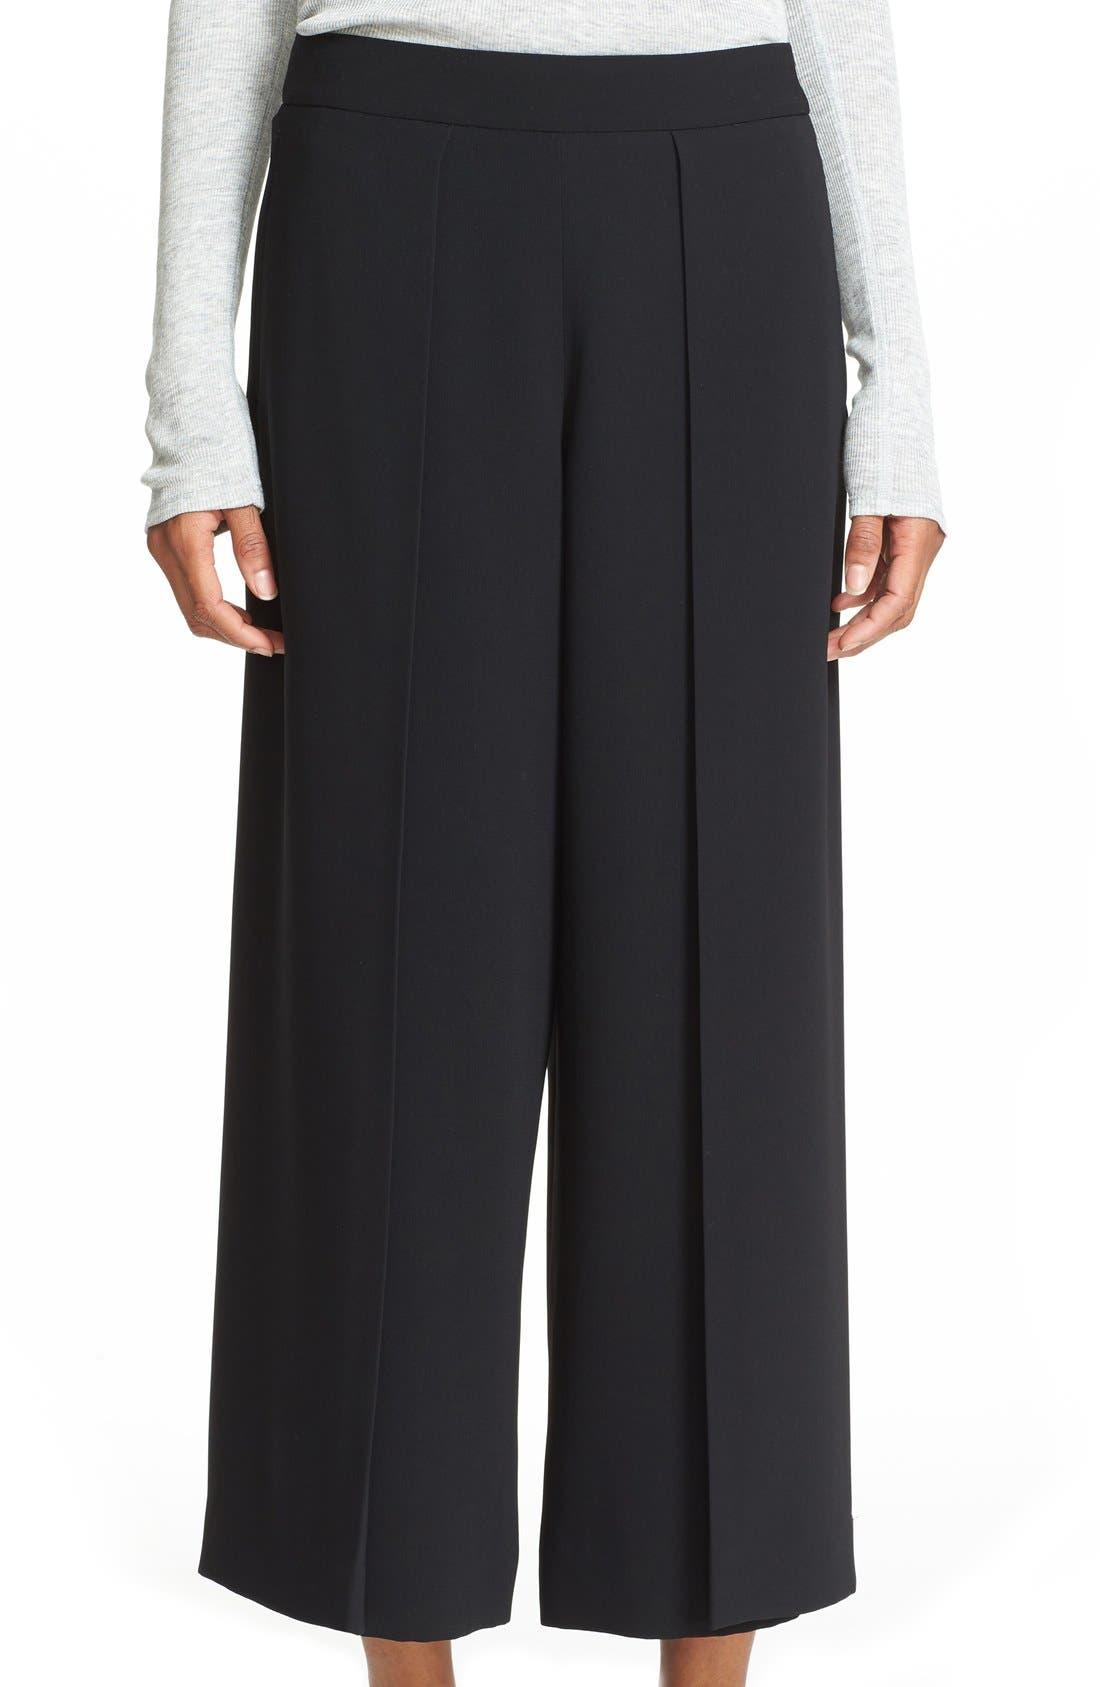 'Rowe' Pleat Crop Pants,                         Main,                         color, 001